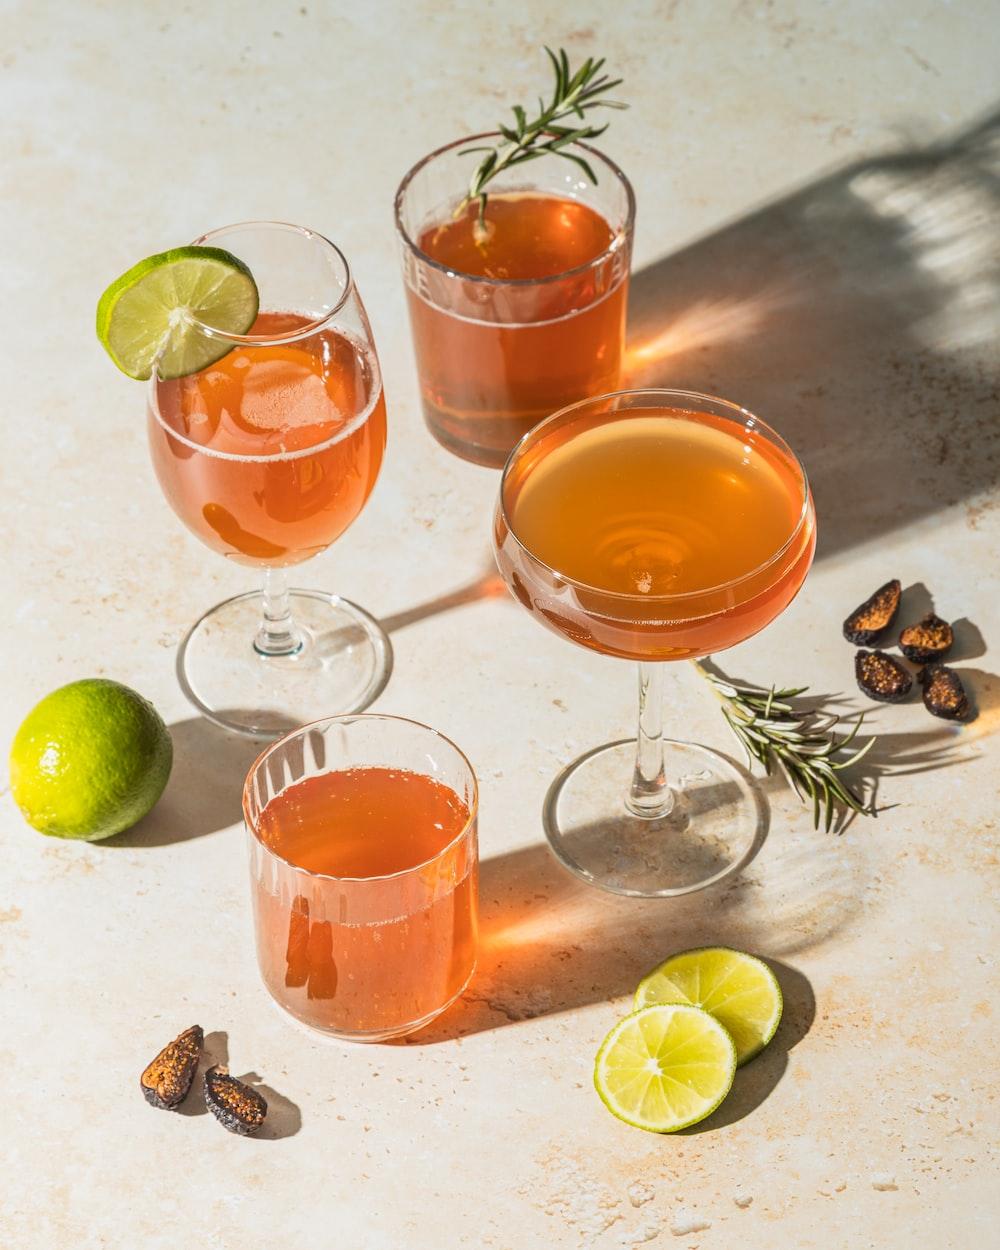 three clear drinking glasses with orange liquid